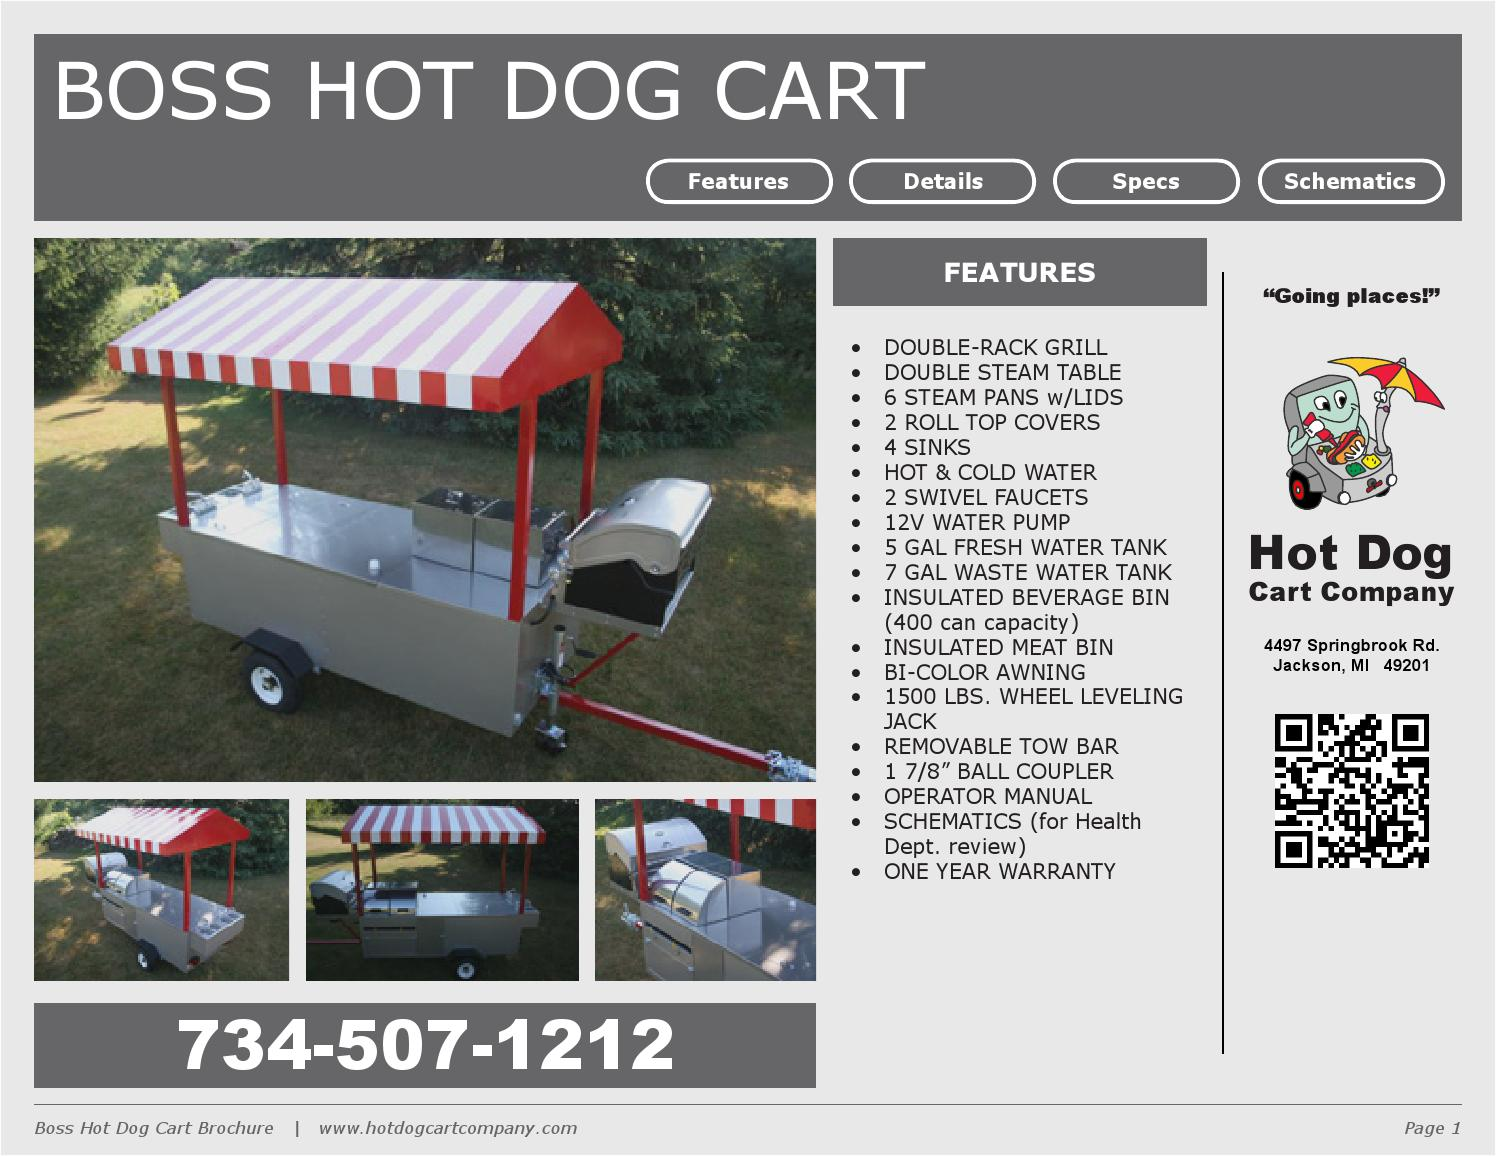 The Boss Hot Dog Cart Hot Dog Cart Company By Hot Dog Cart Company